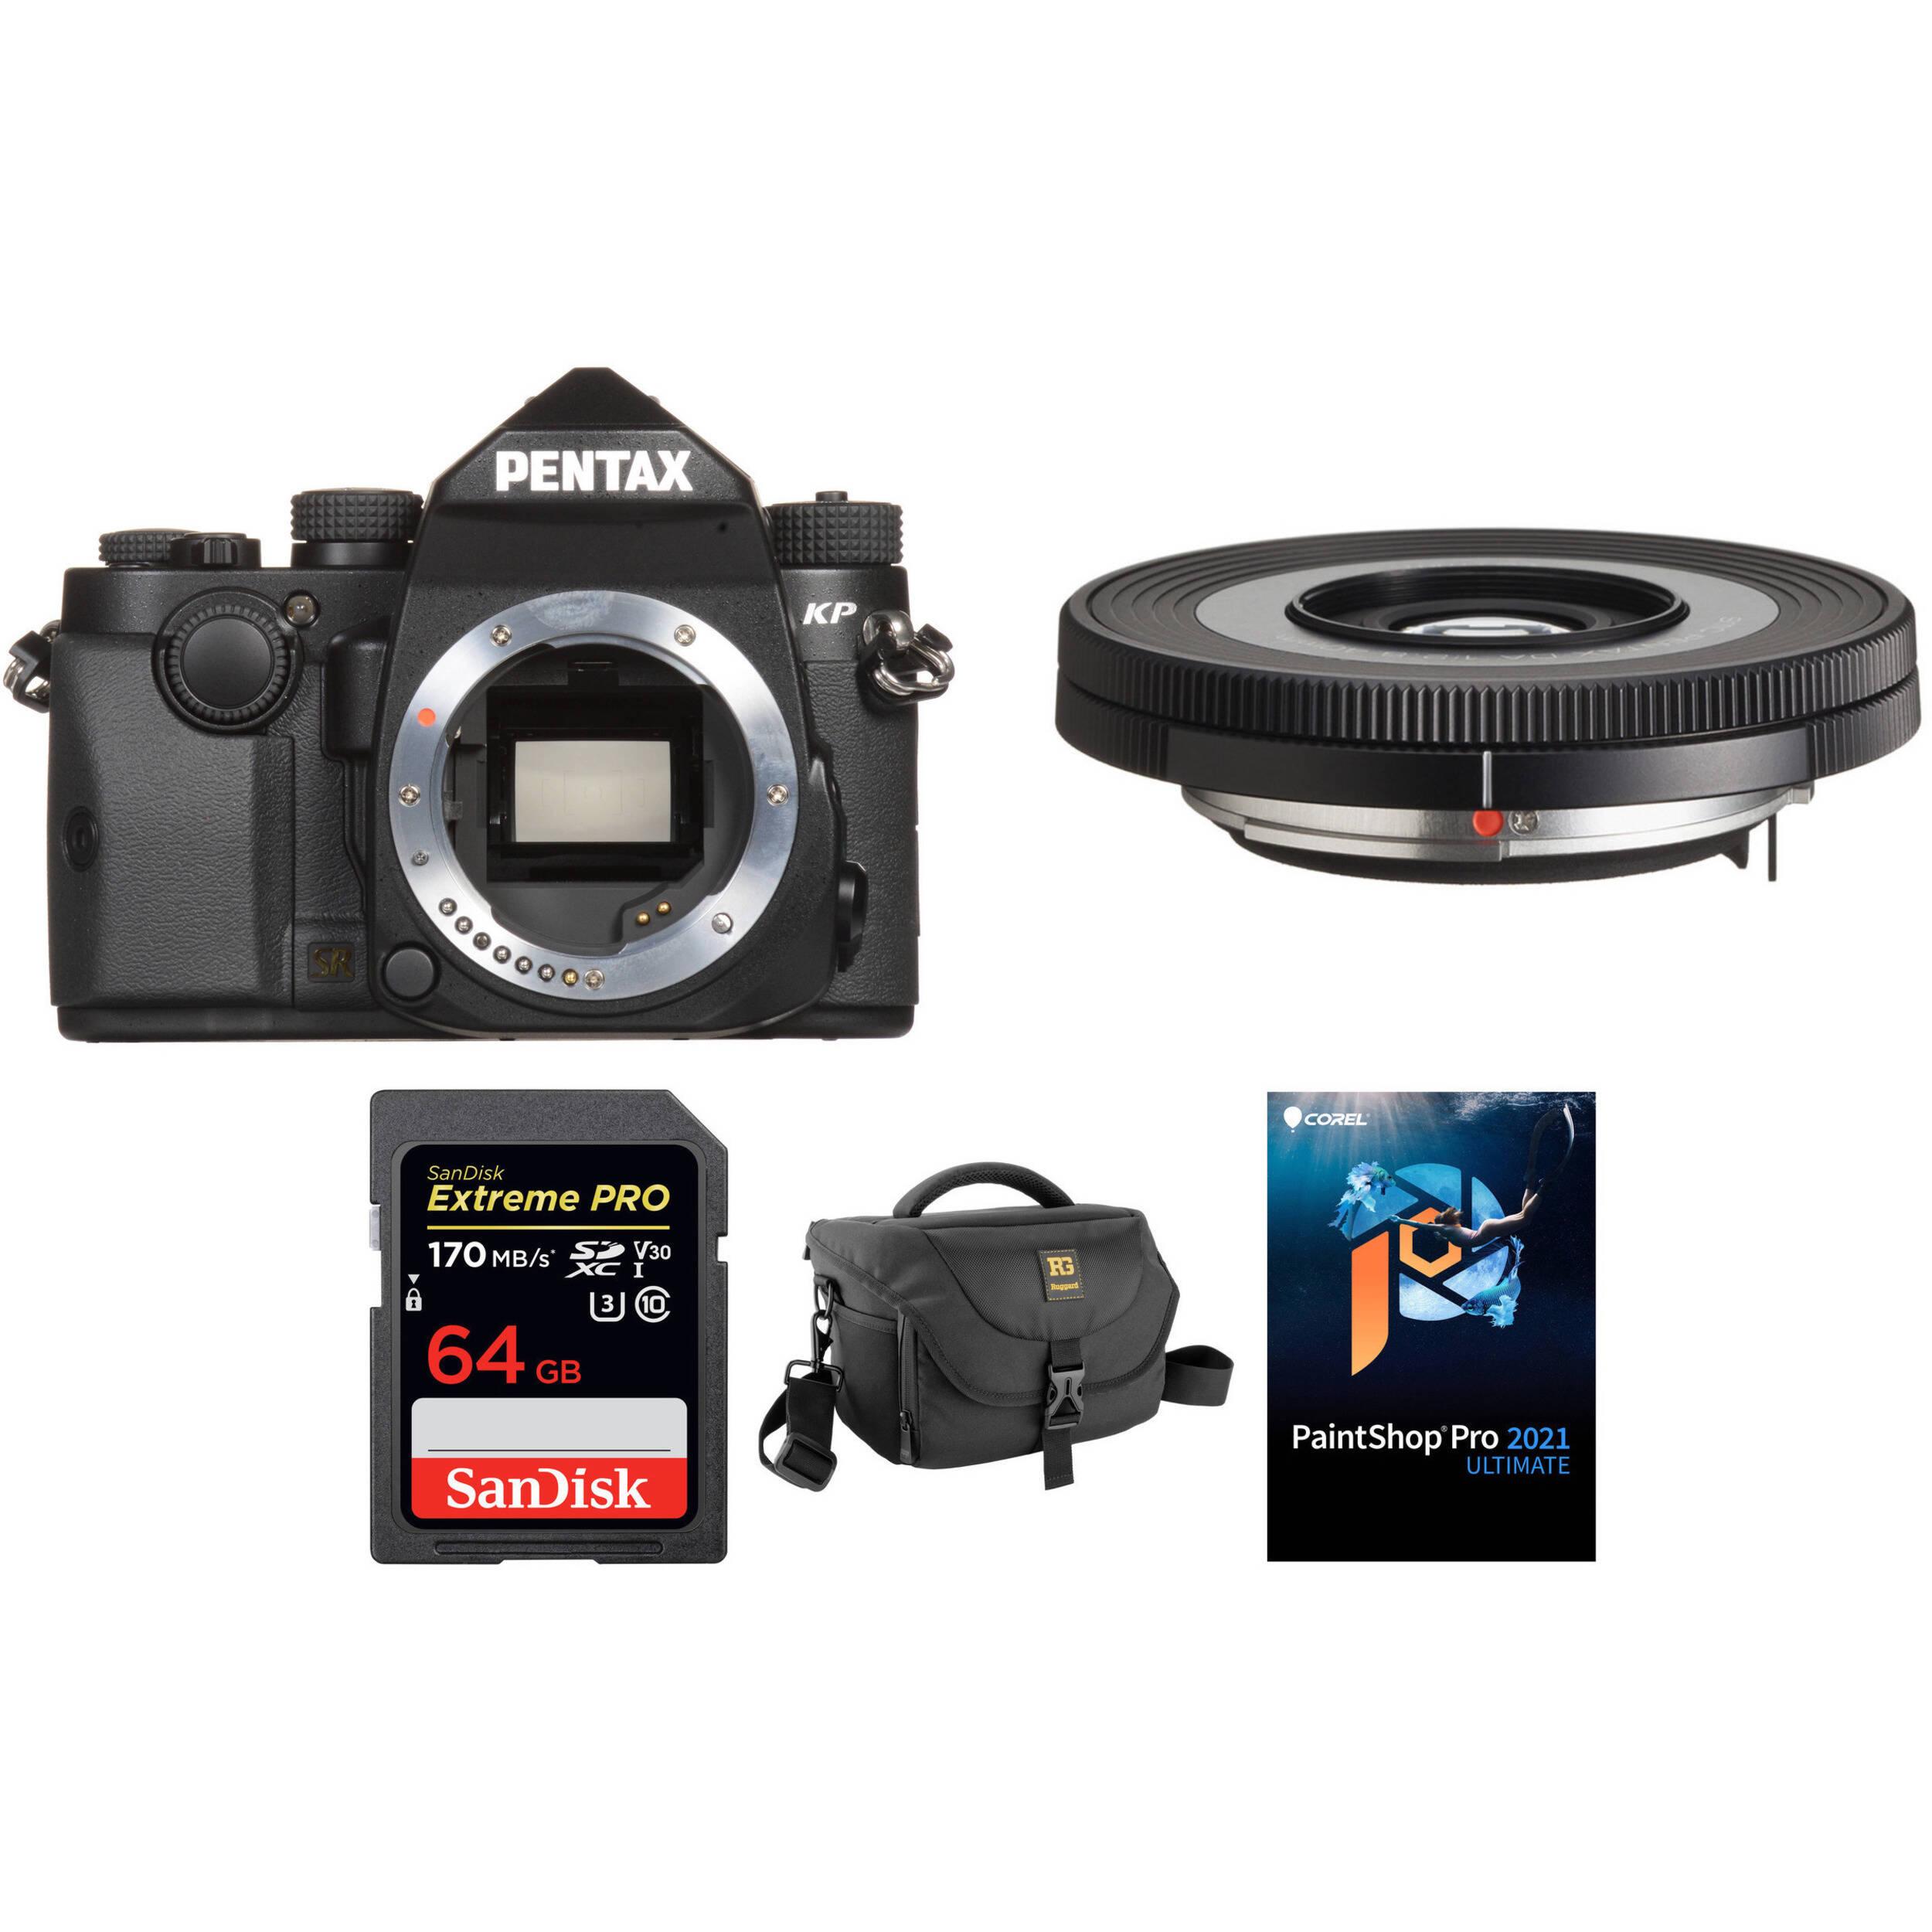 Gadget Career Camera-On-Camera adapter for Pentax KP